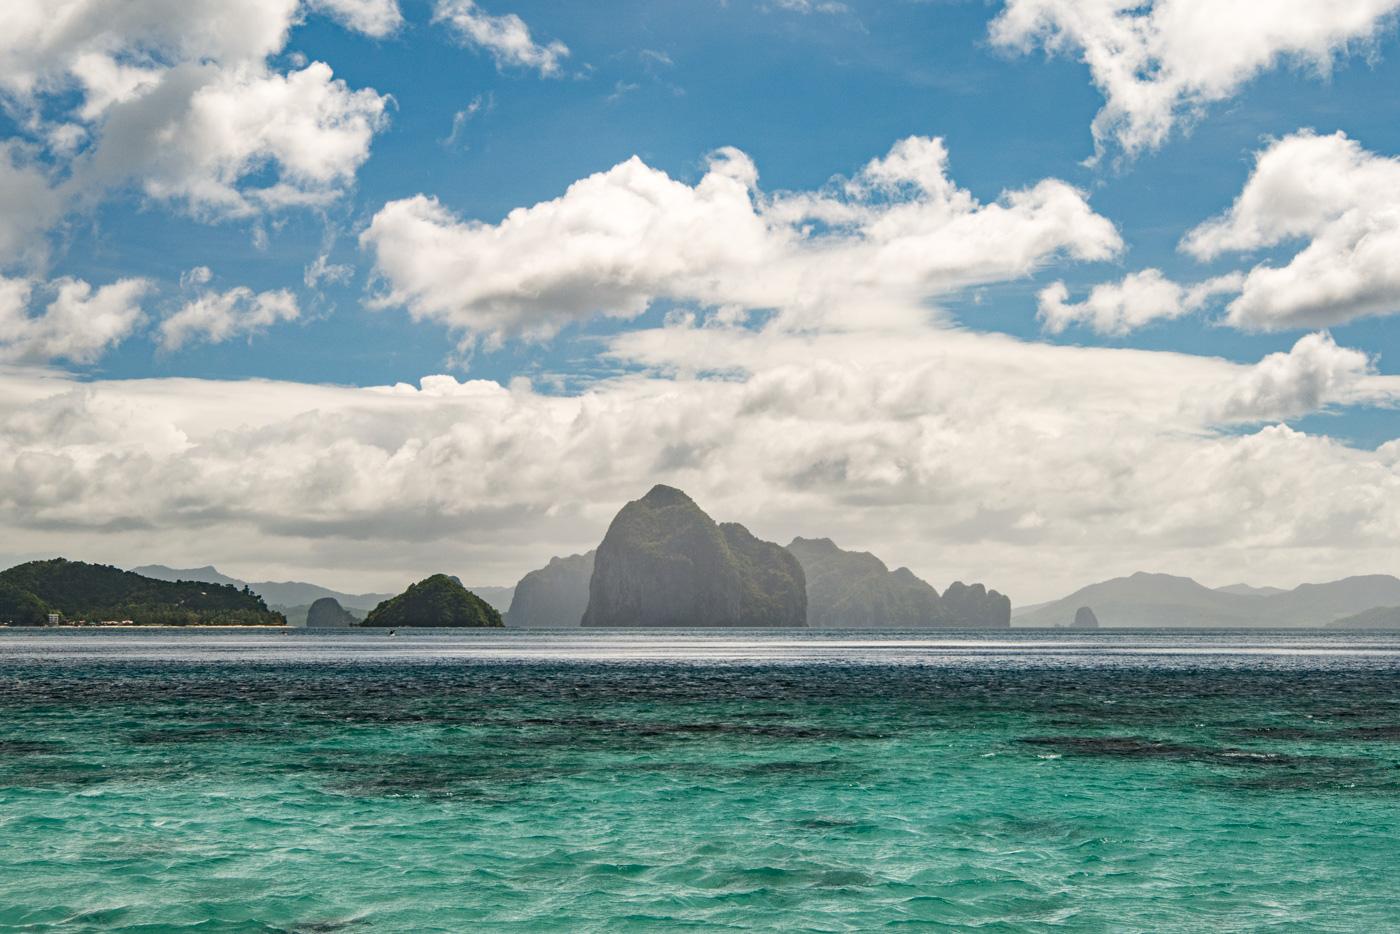 Die Inseln des Bacuit Archipels bei El Nido, Palawan - Philippinen